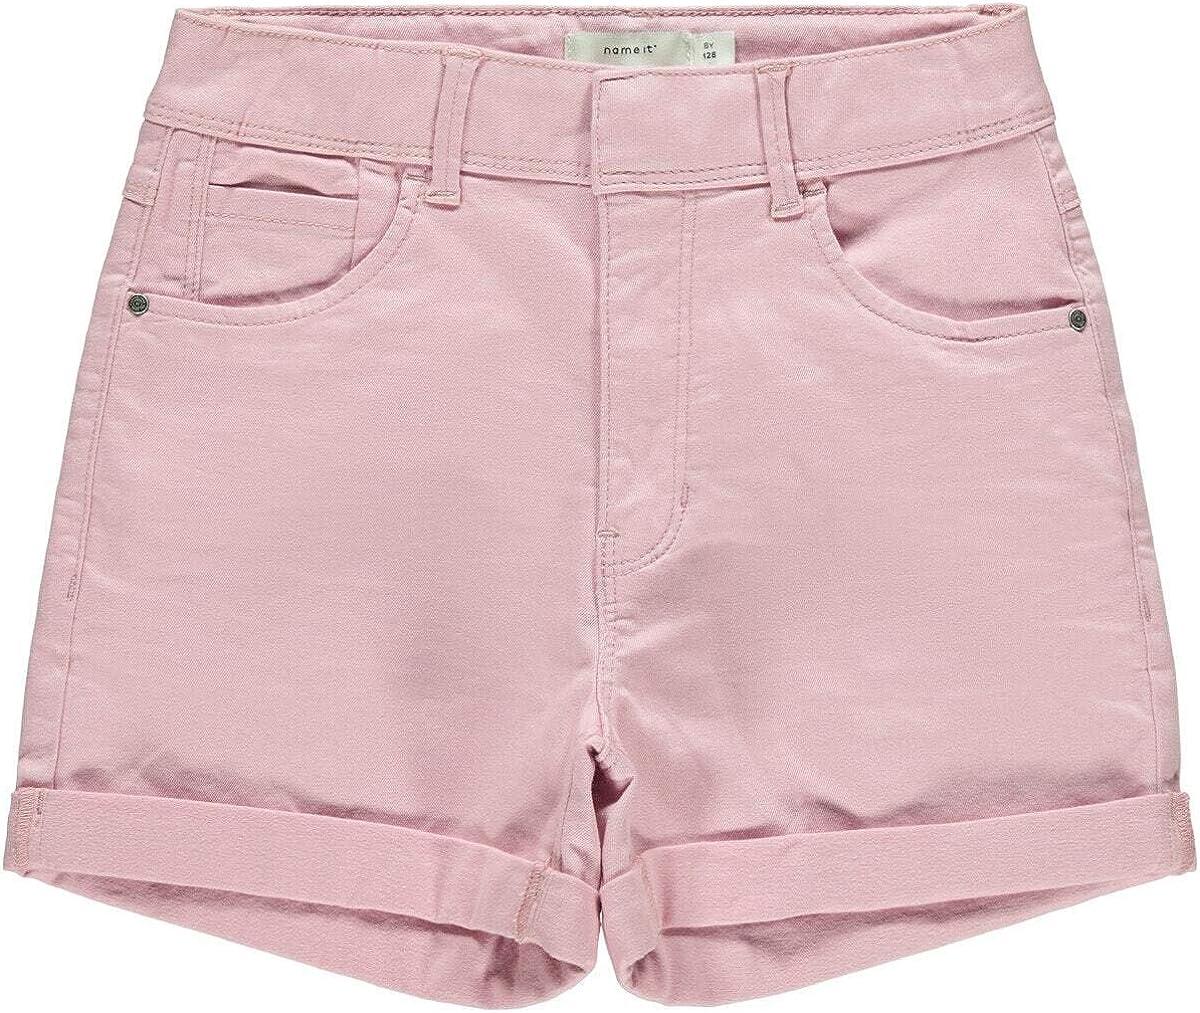 Name It Pantaloncini Bambina